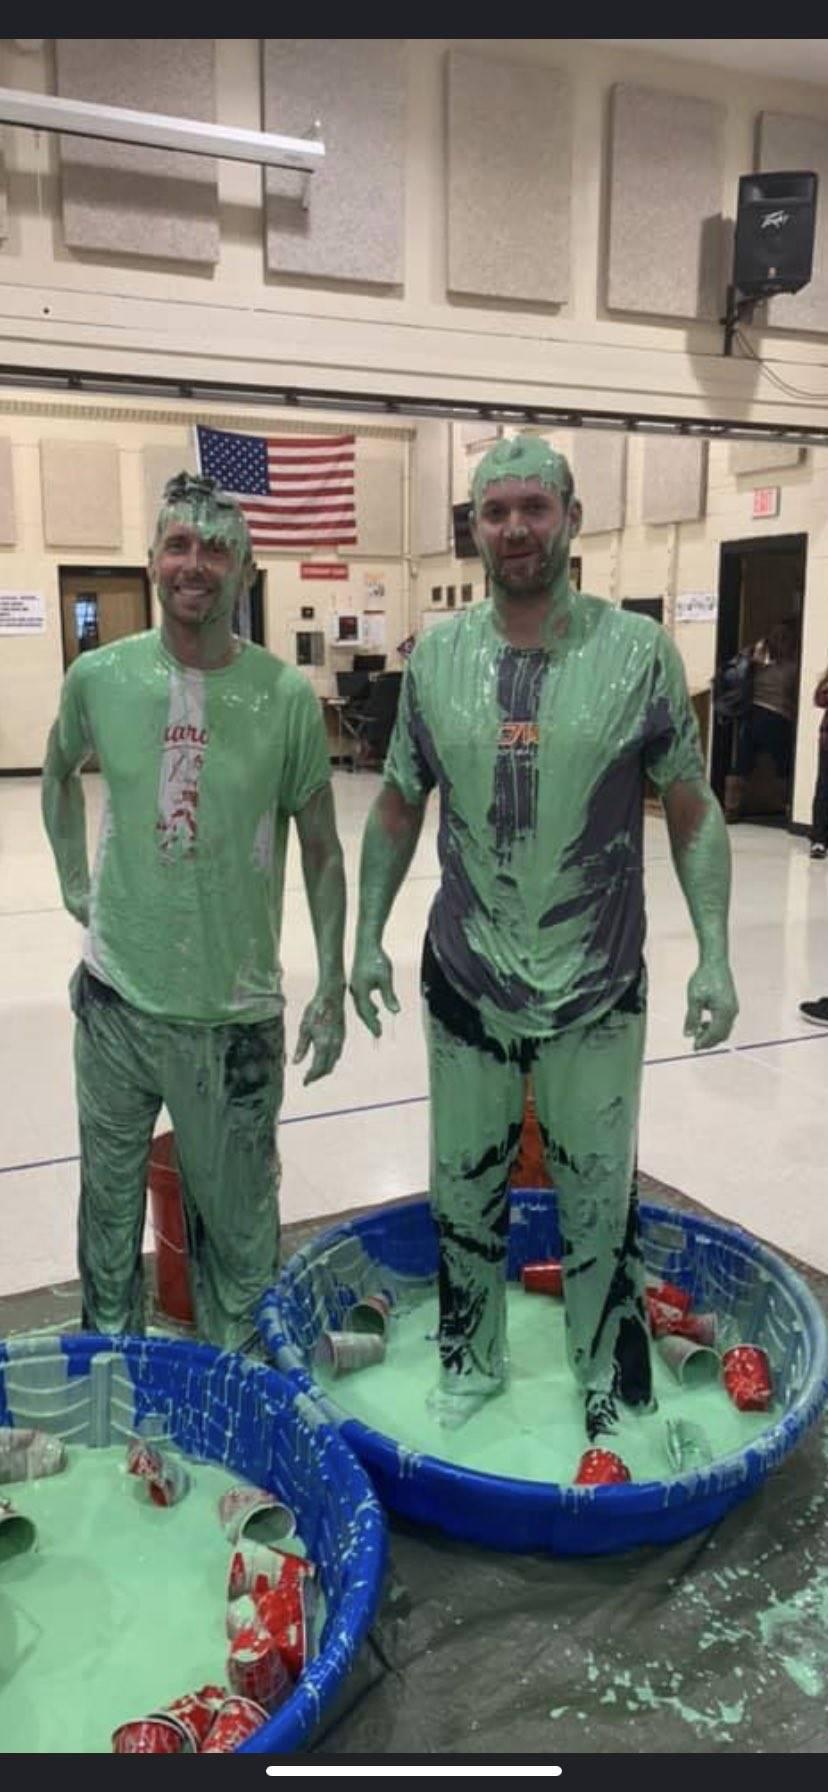 Slime Incentive for Students - Mr. Prezioso and Mr. Hazen are great sports! - Fall 2019